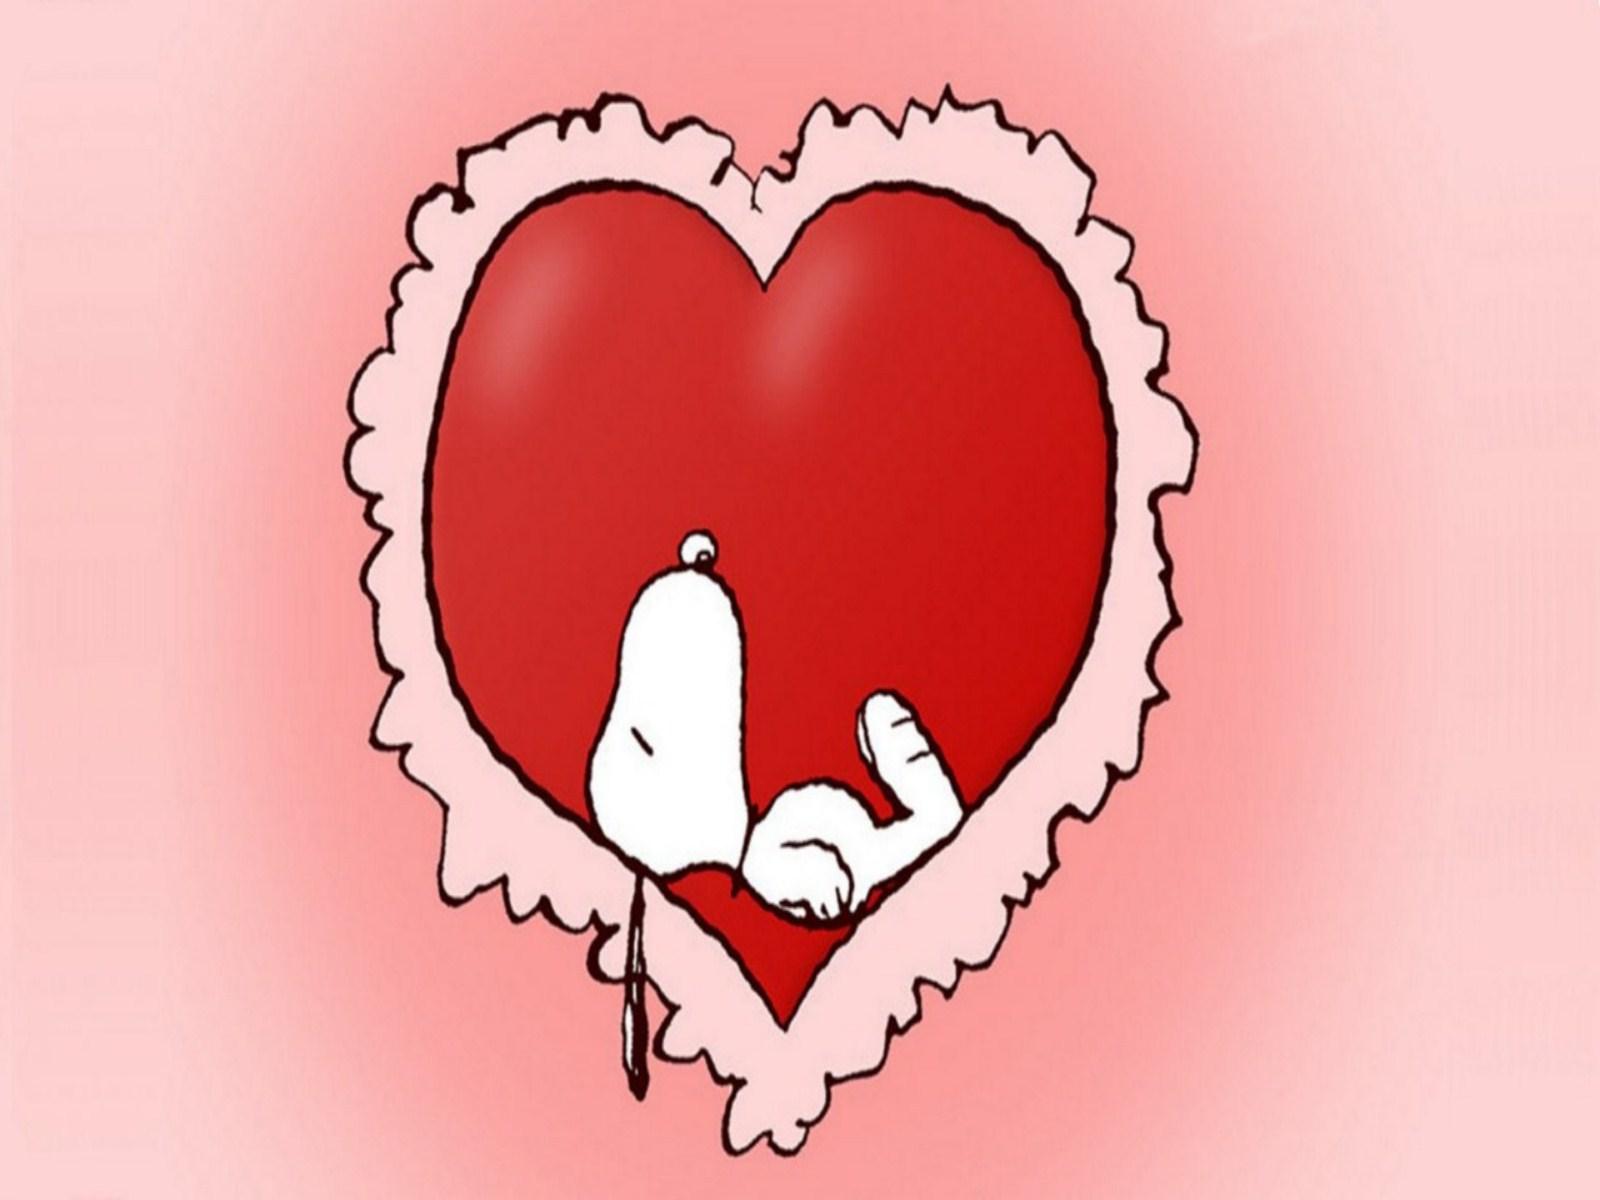 Wallpaper Snoopy Love Valentine Computer Desktop Funny   Doblelol 1600x1200